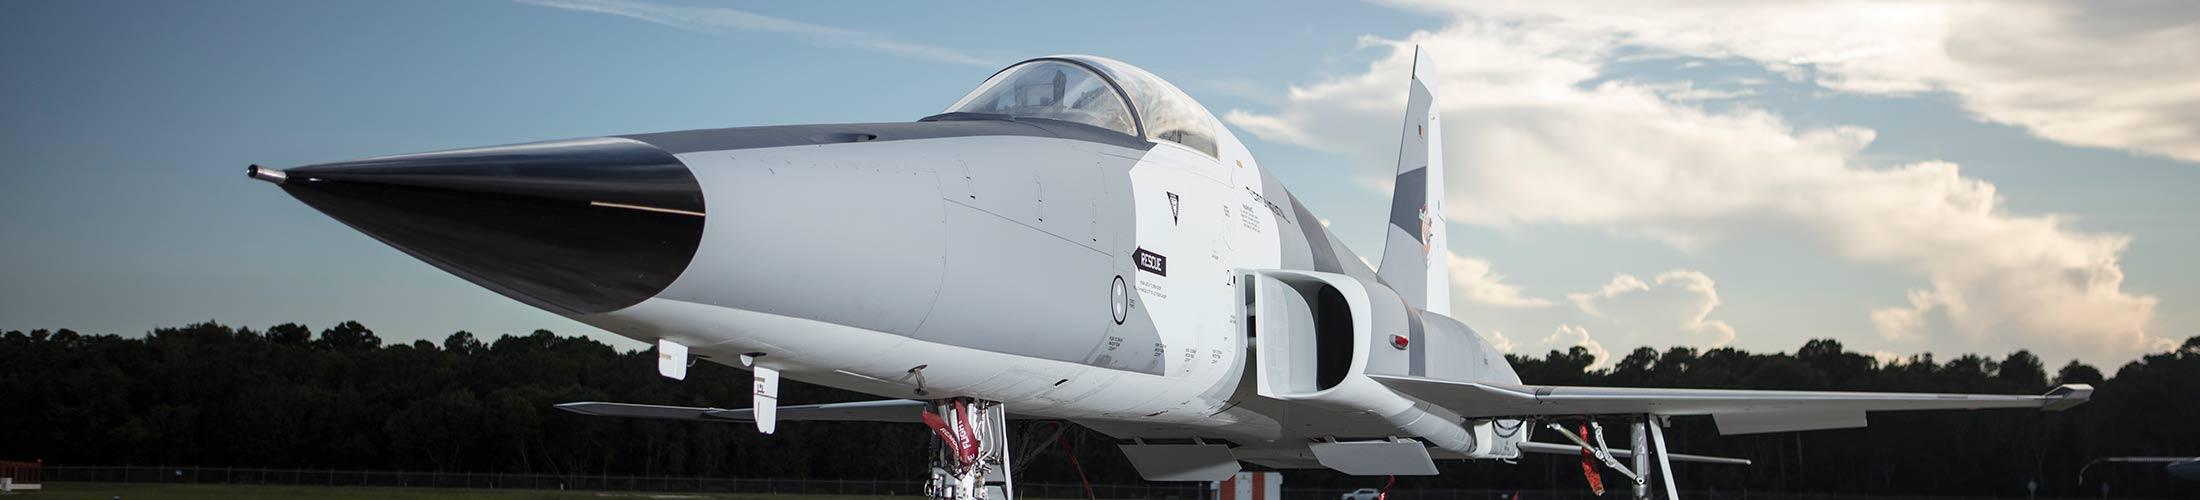 F-5 Advanced Tiger™( F-5AT) - Tactical Air Support